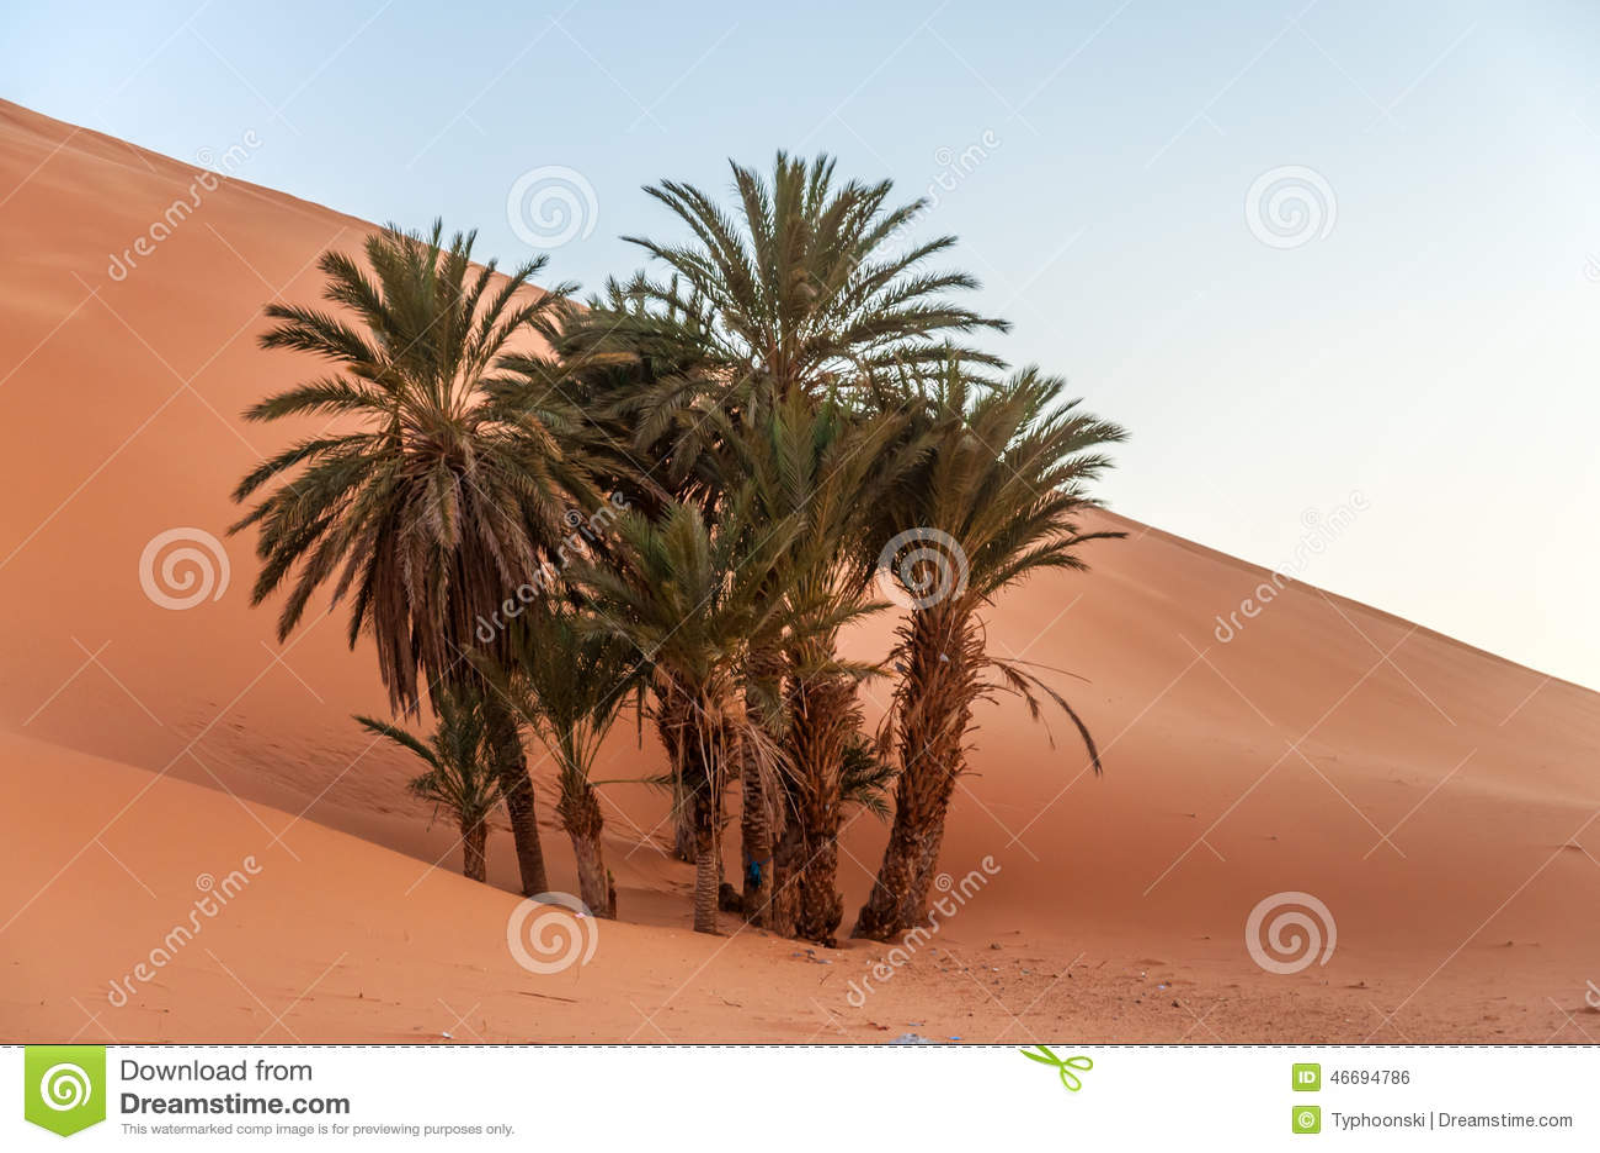 50 dating in palm desert